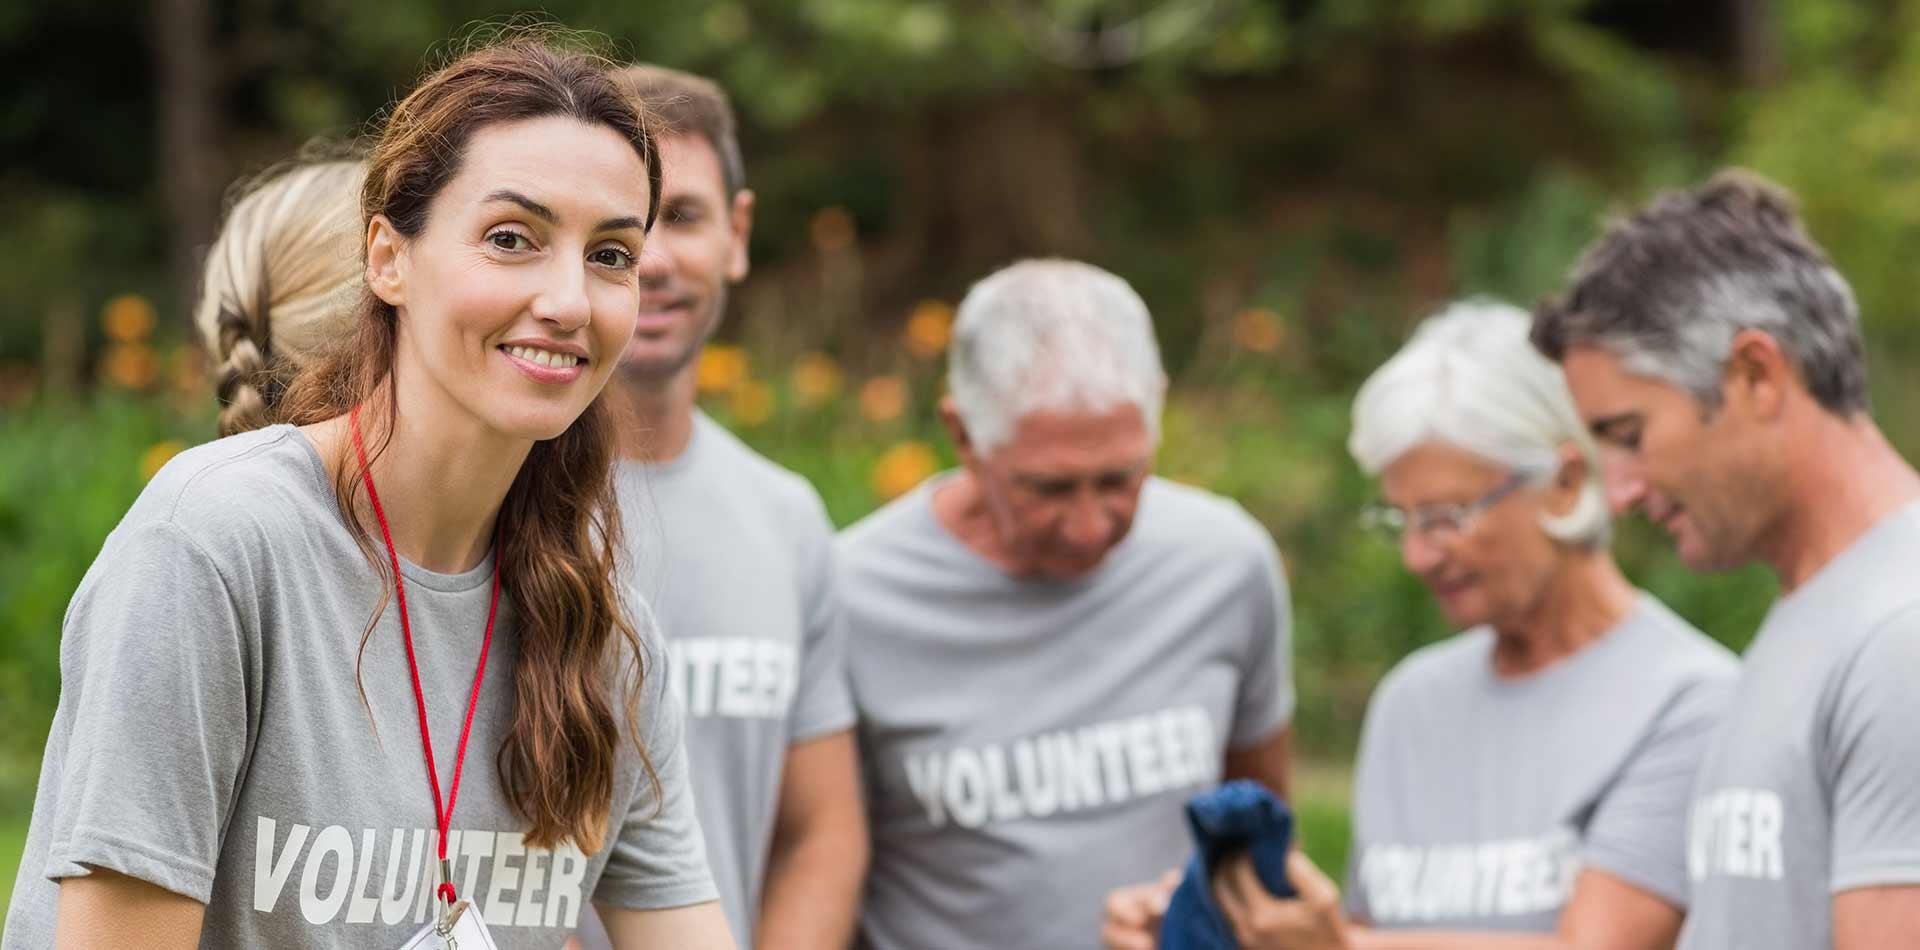 Join Asplecare team of volunteers